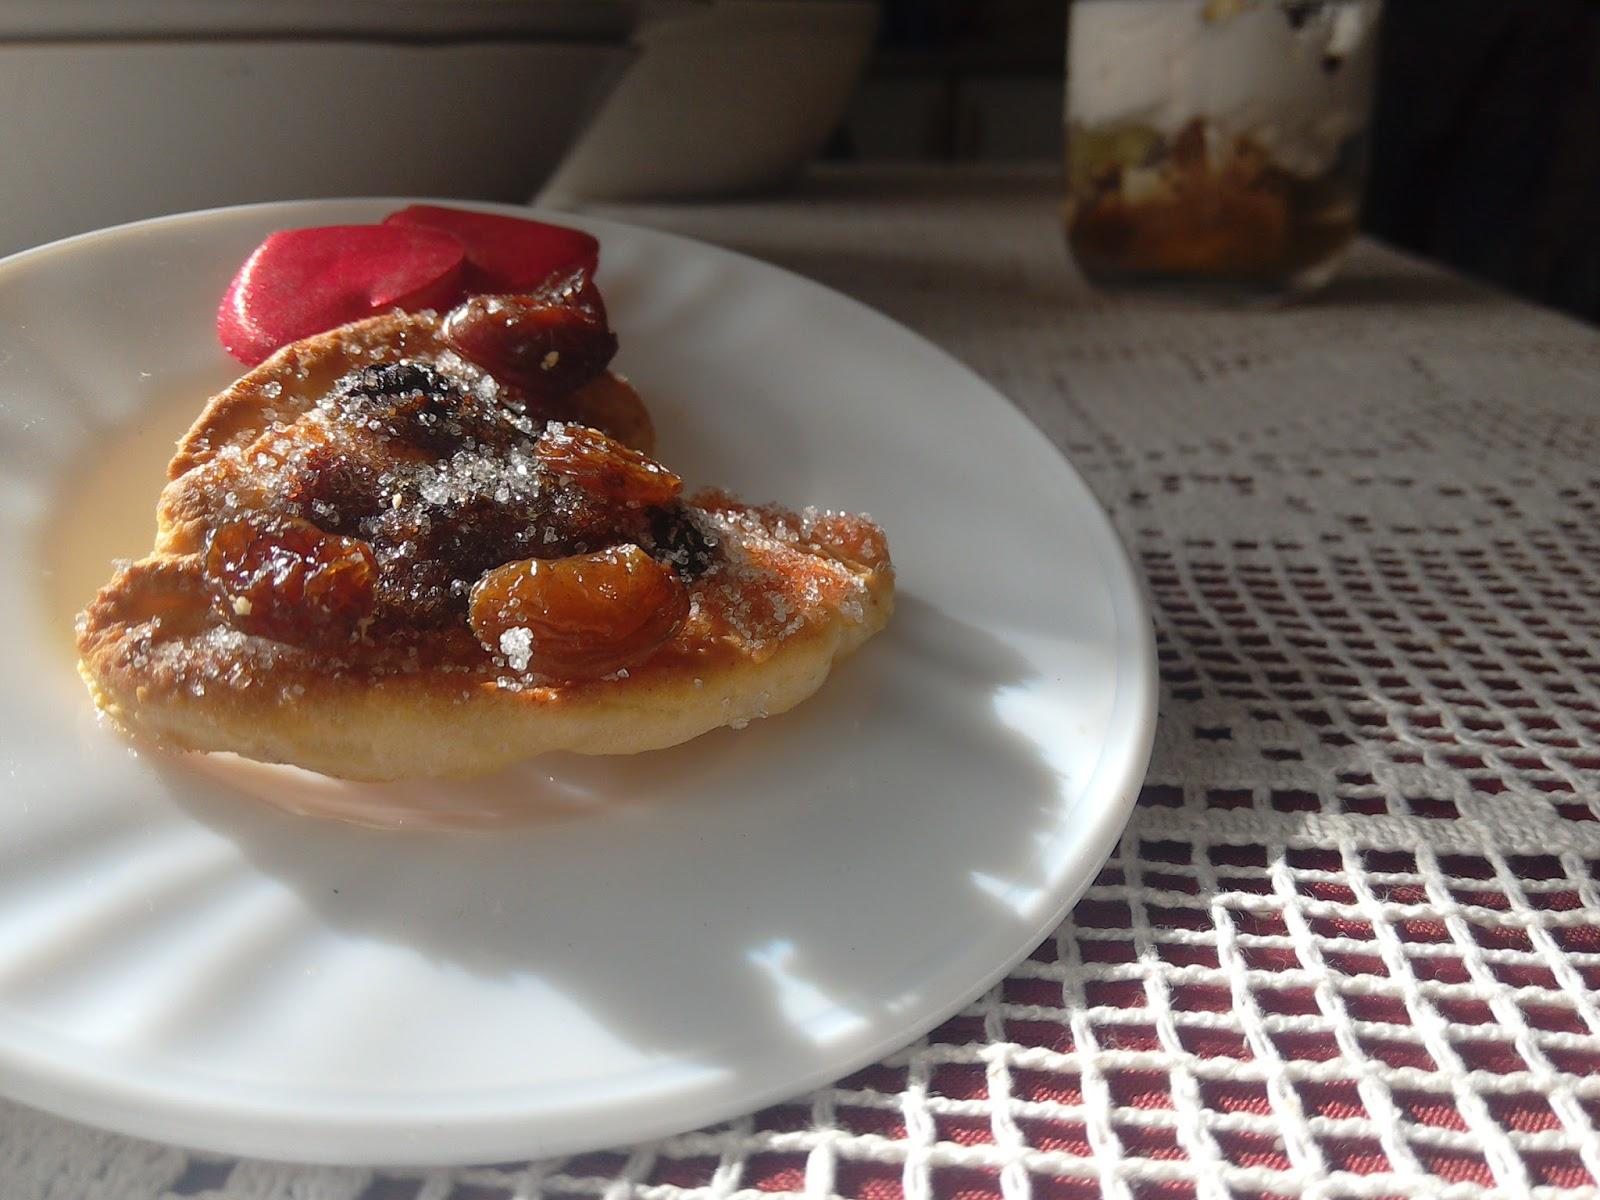 kolačić u obliku srca s grožđicama